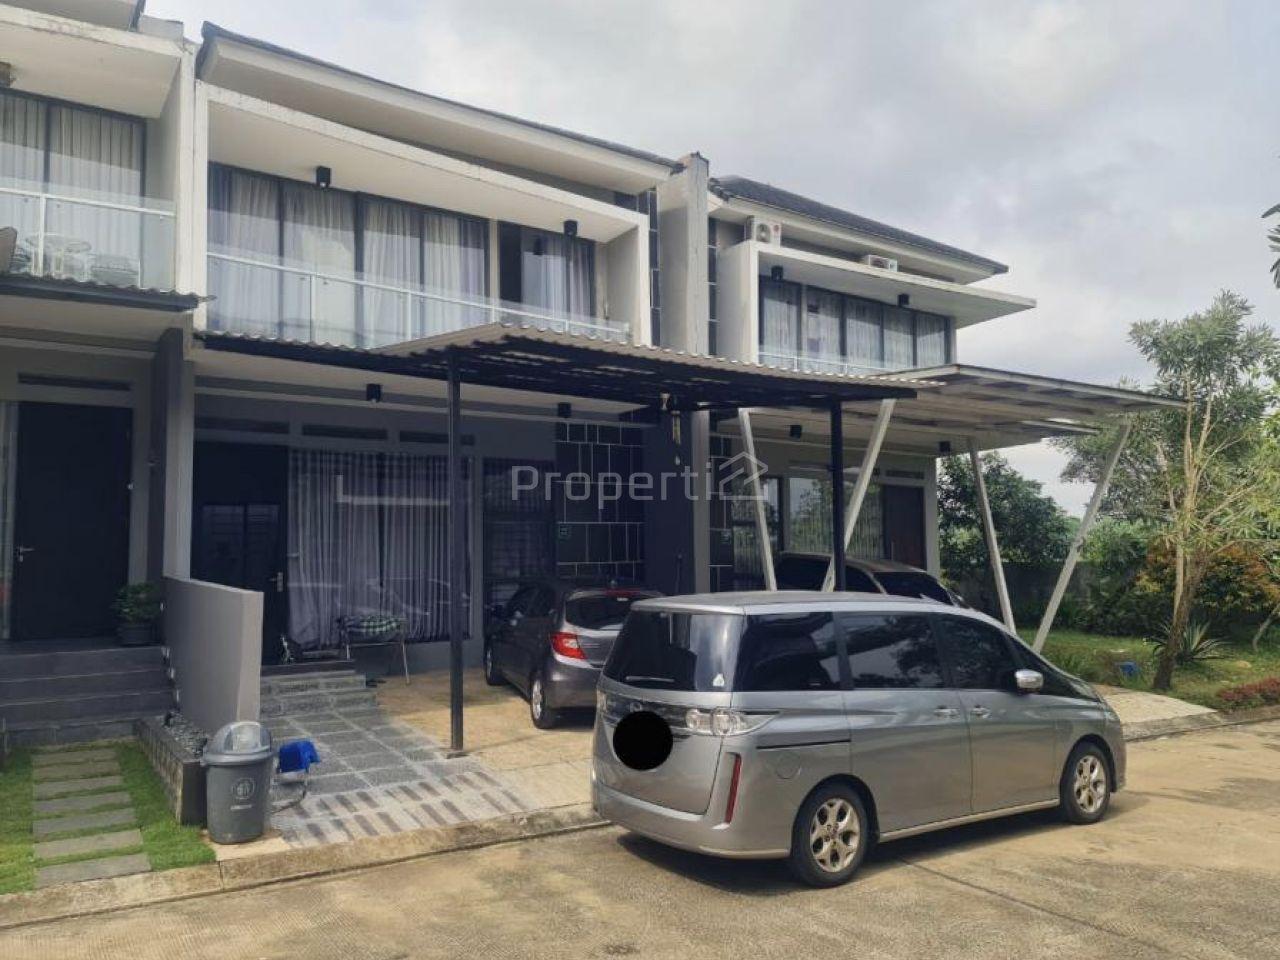 2 Storey House at Golden Park 2, Cisauk, Banten